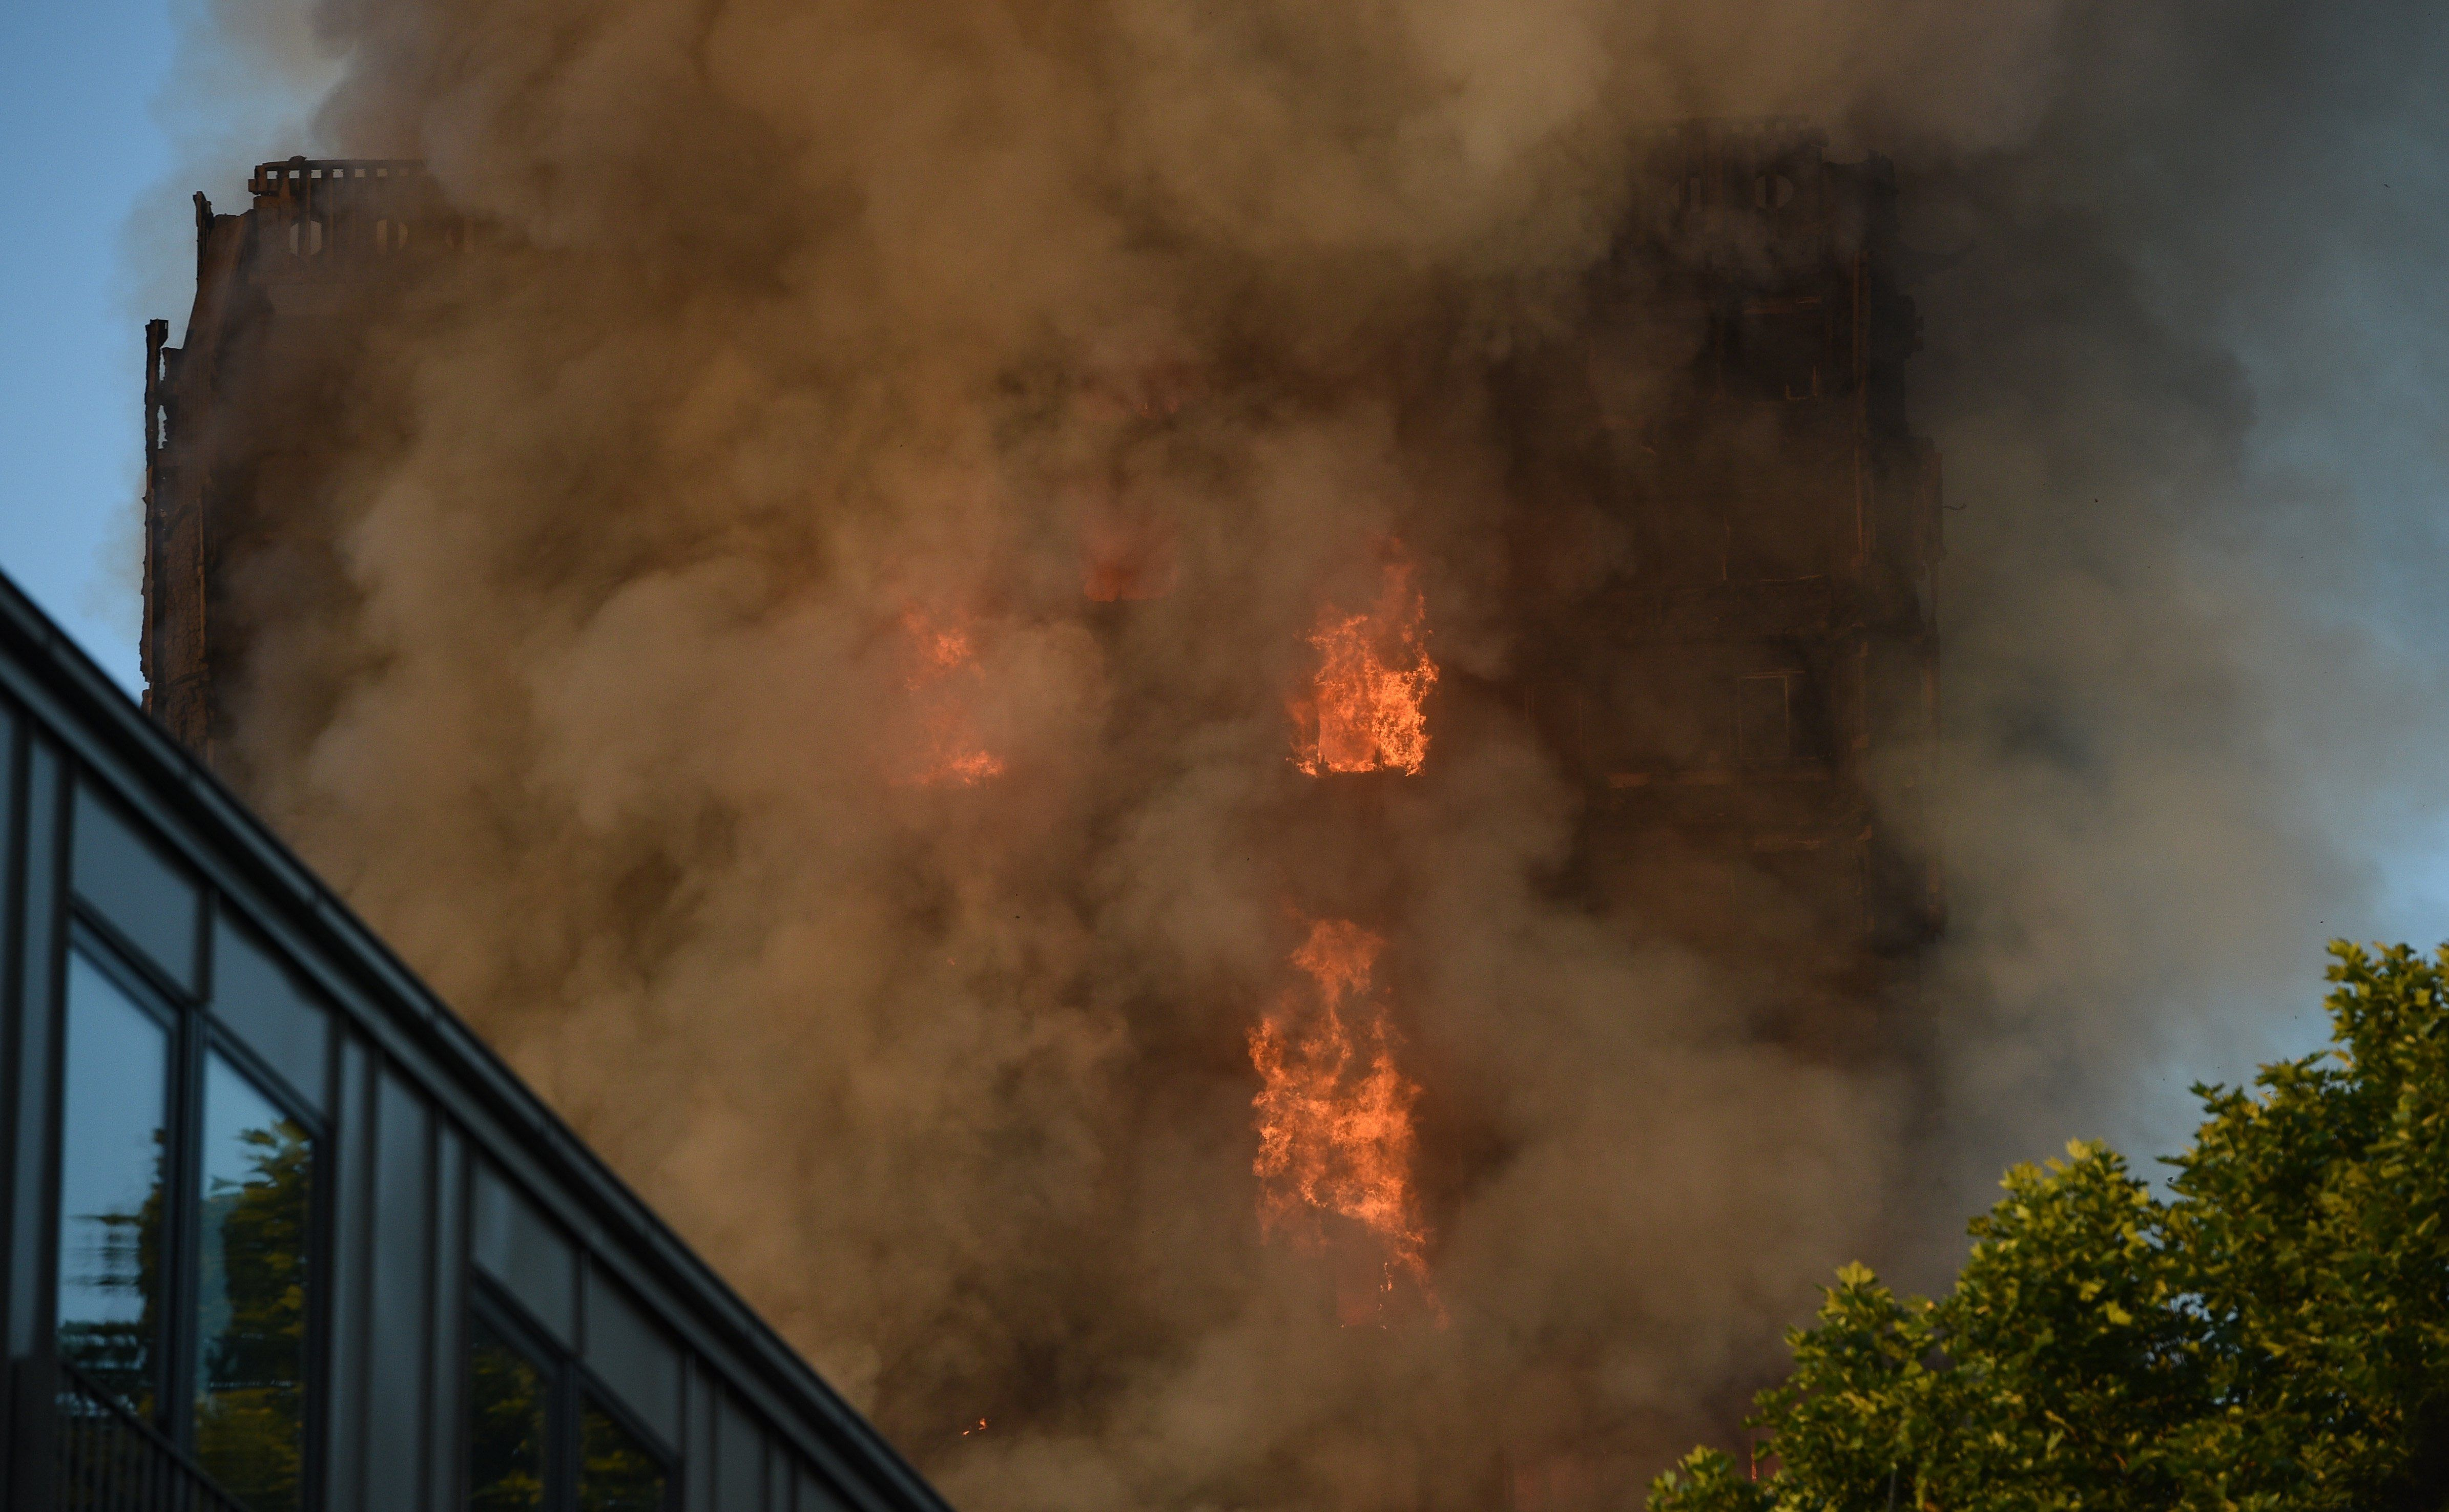 Incendio en la Grenfell Tower